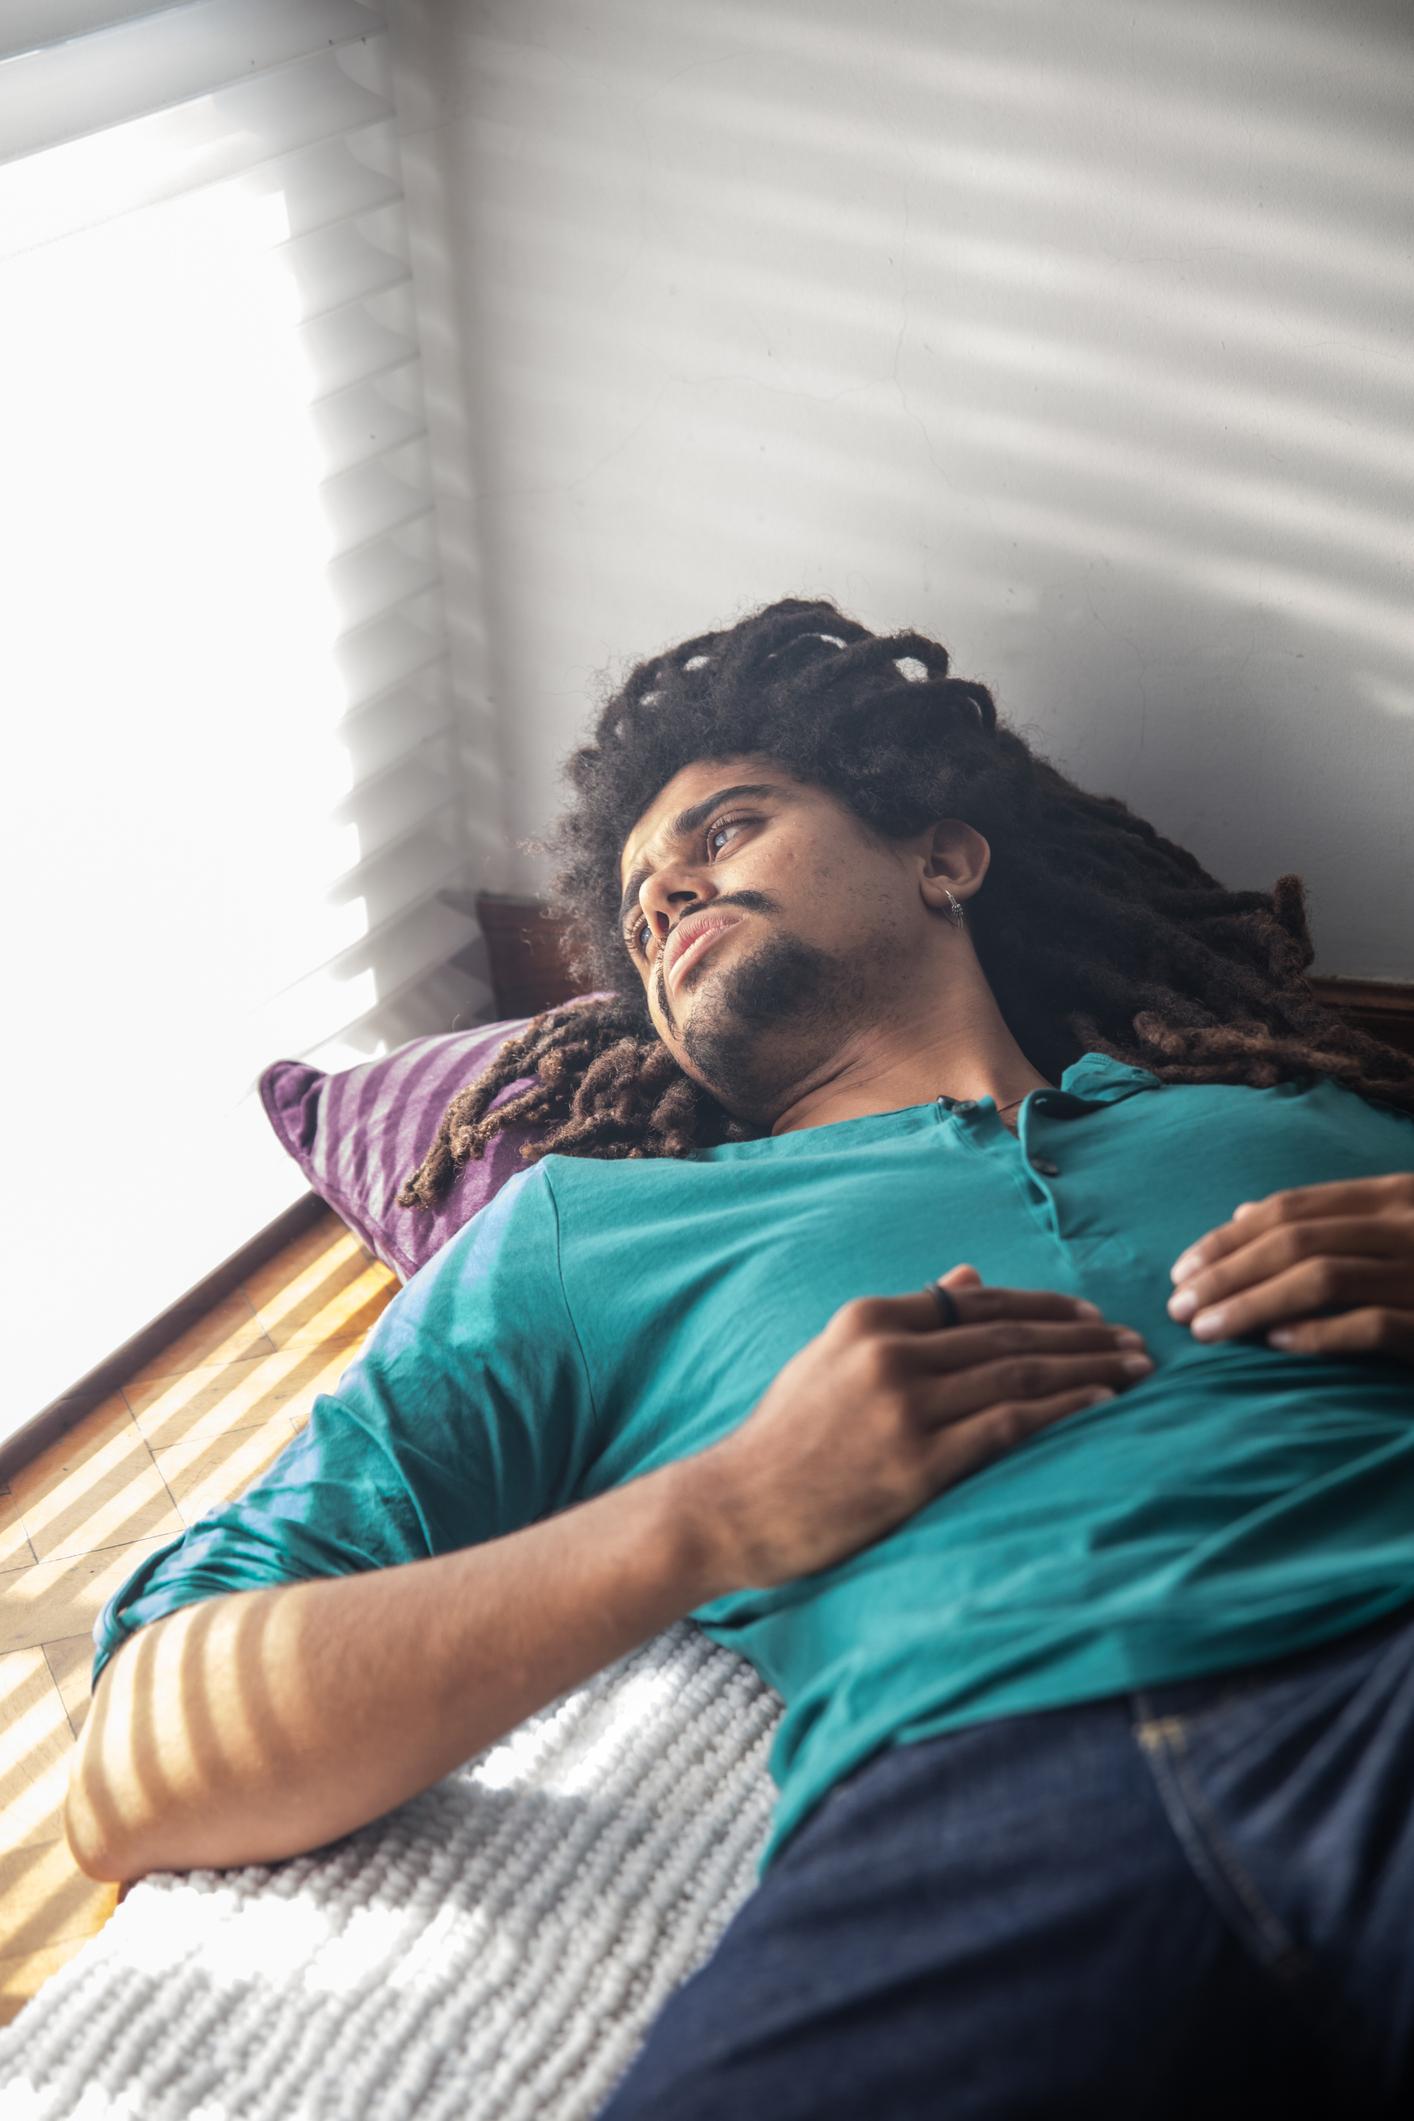 Thoughtful rastafarian lying down on floor at home looking away